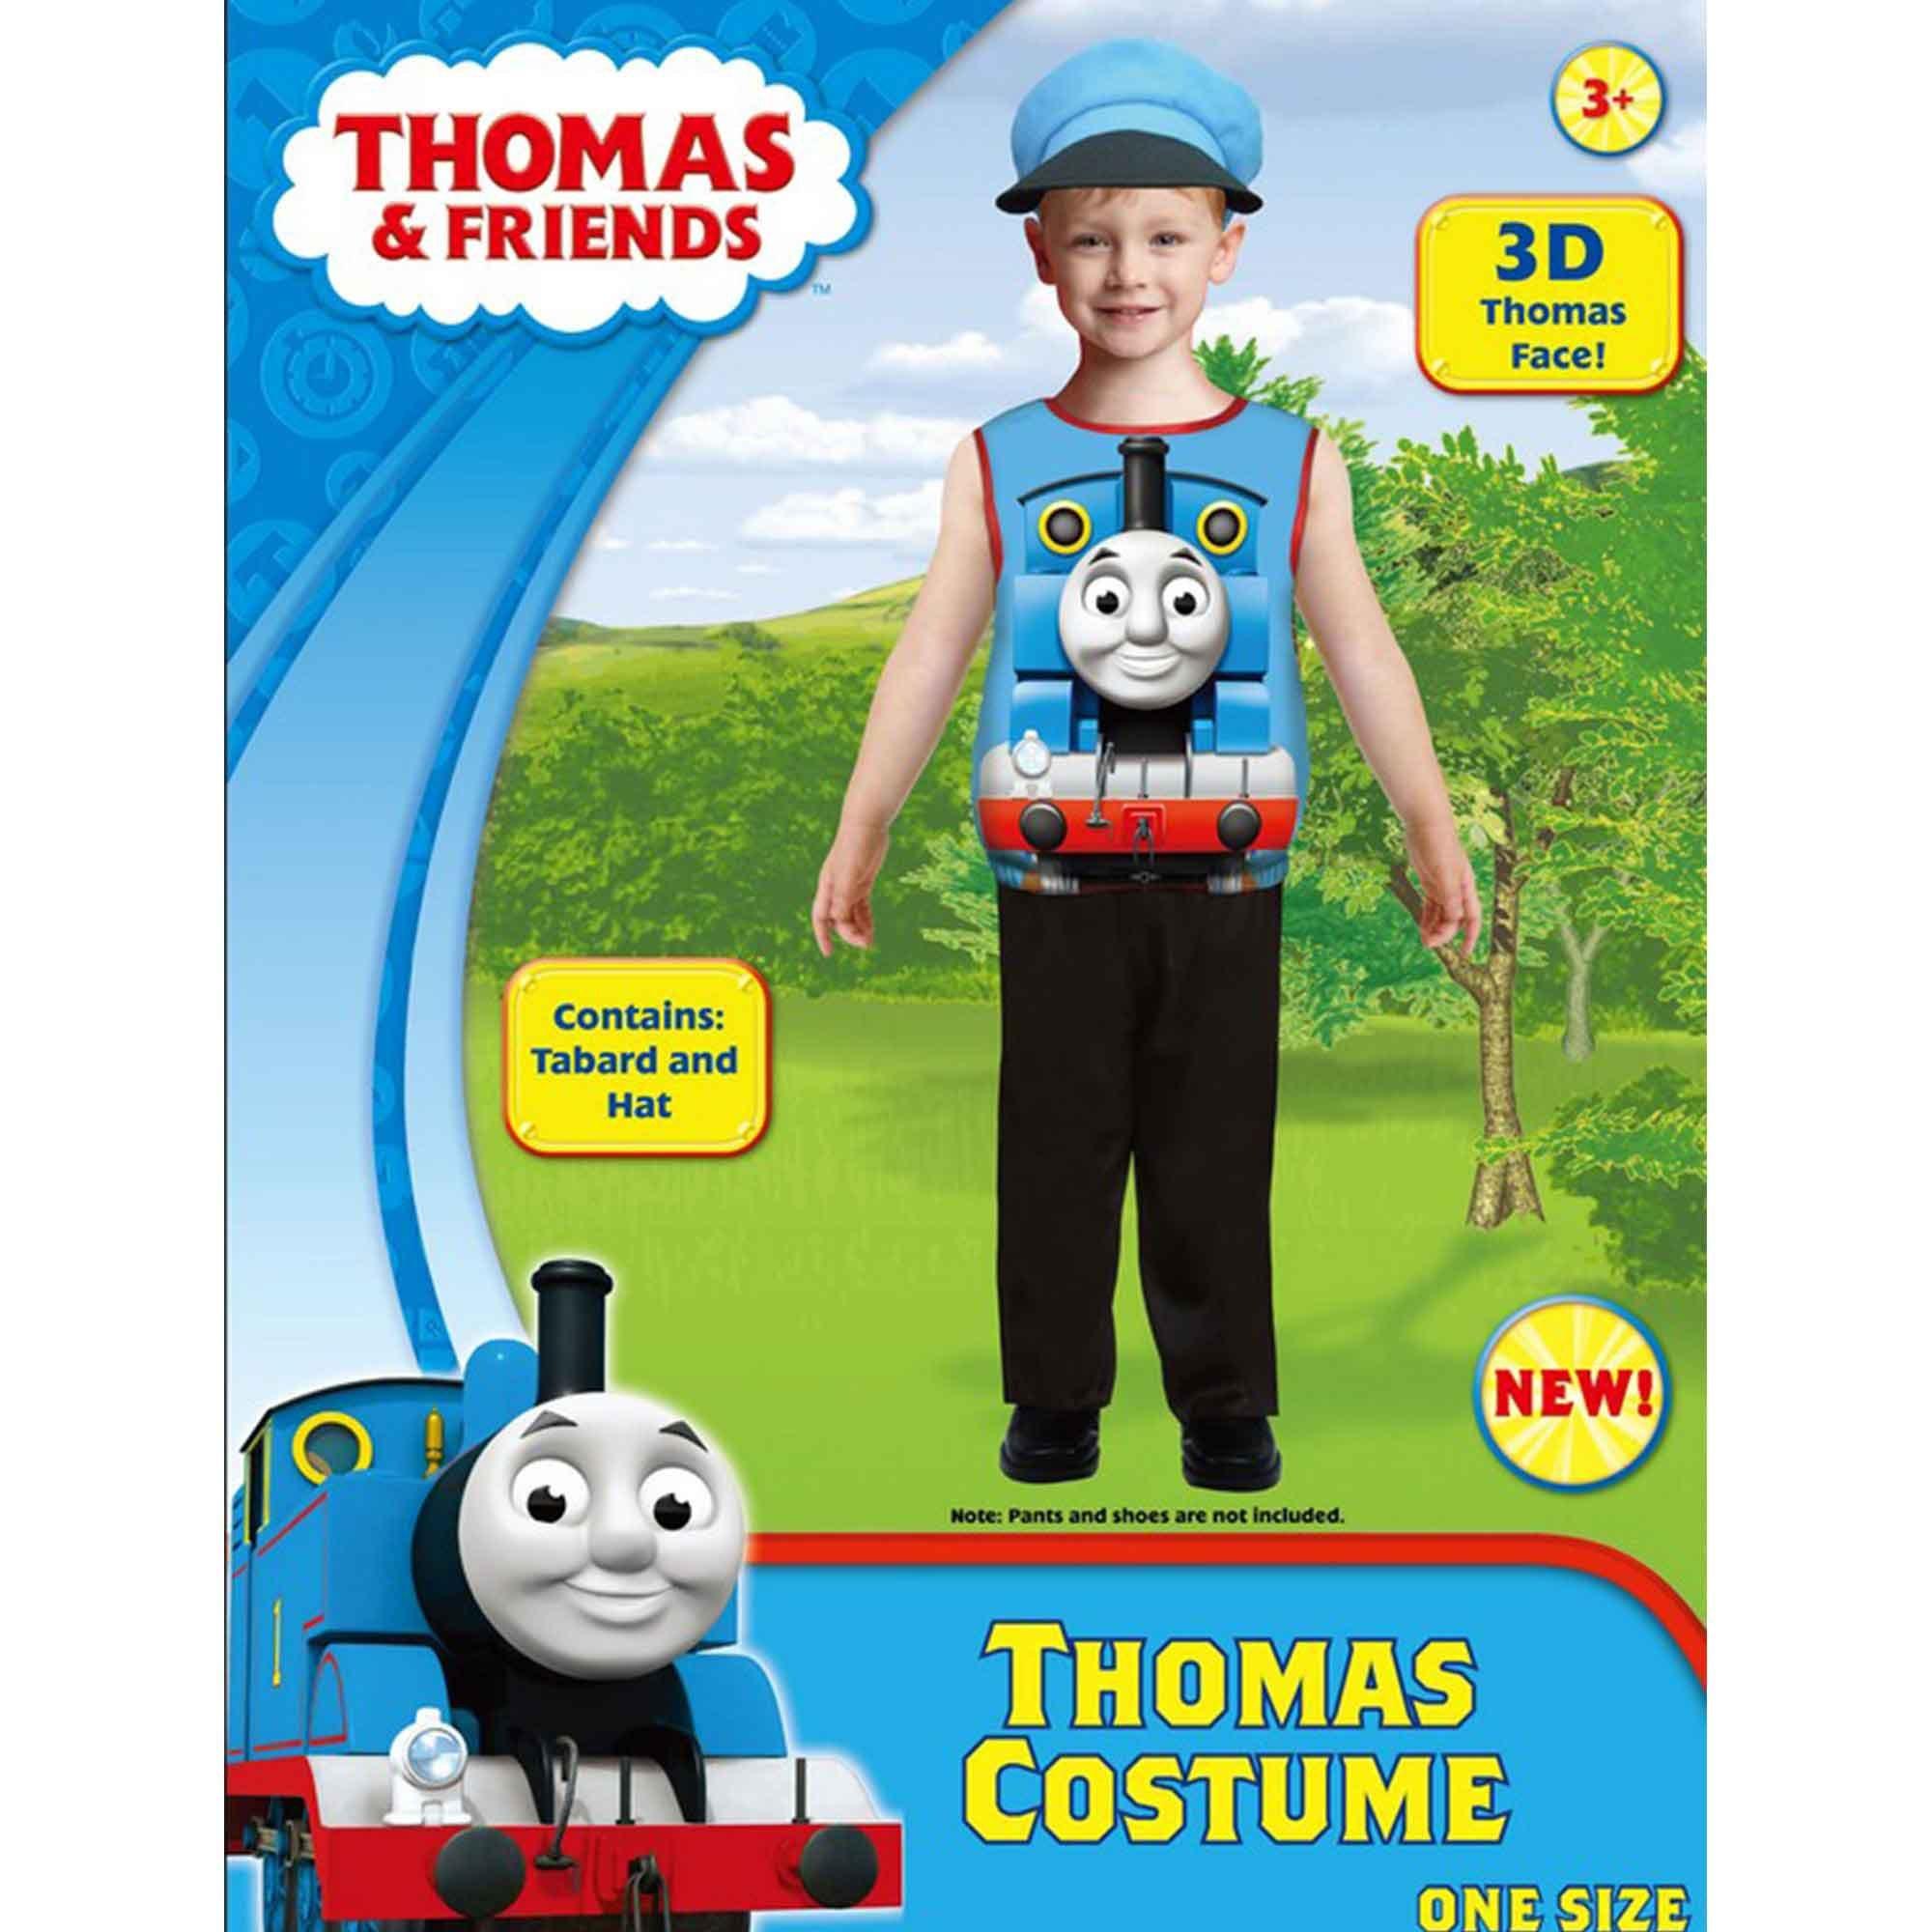 Thomas & Friends Costume Child